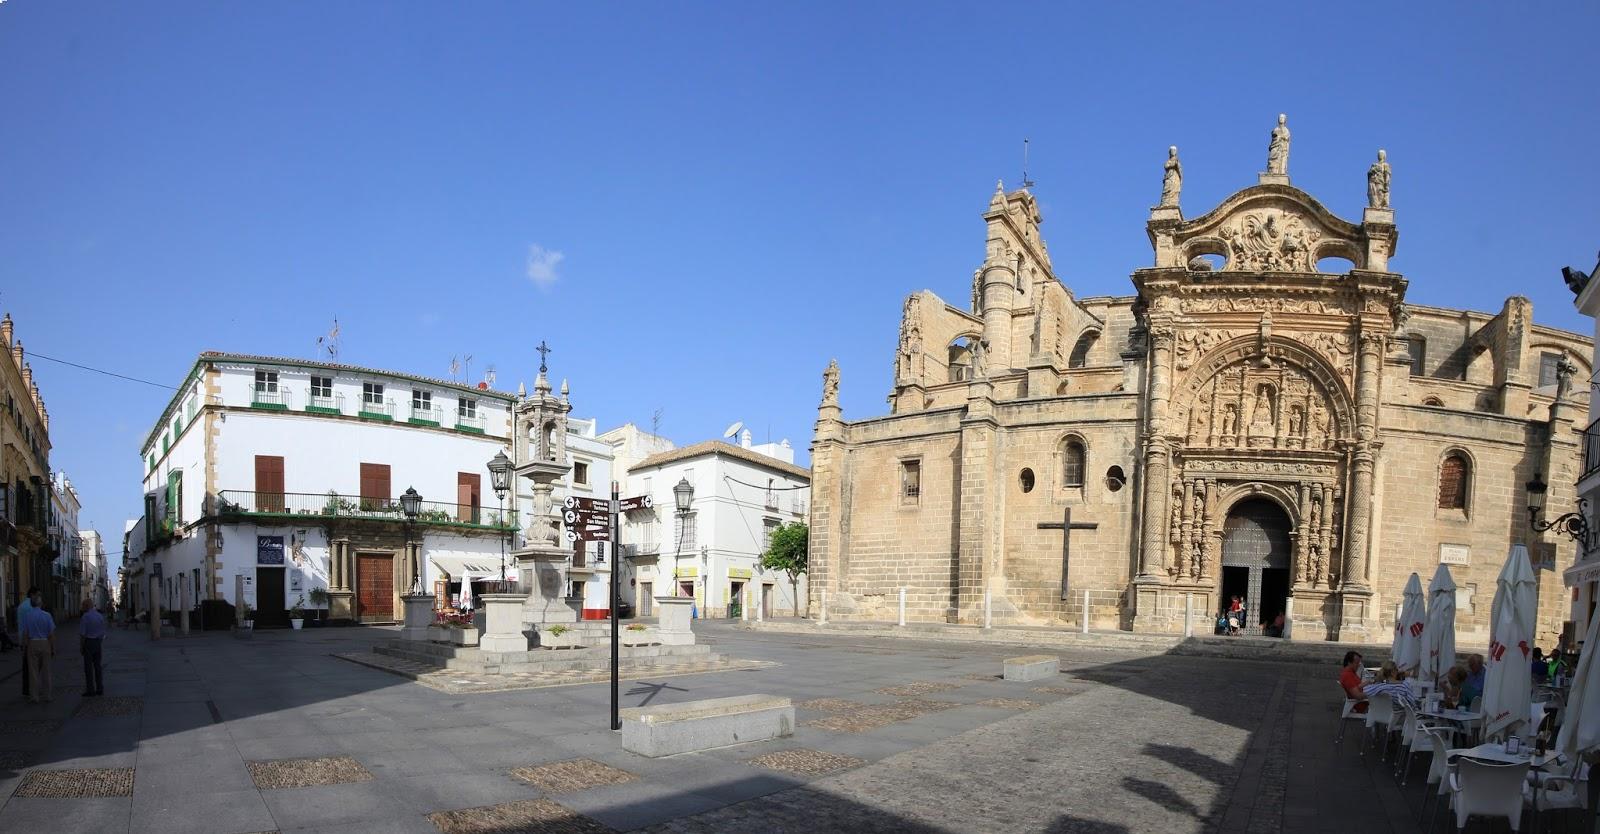 Where 39 s trevor iglesia mayor prioral el puerto de santa maria spain - El puerto santa maria ...